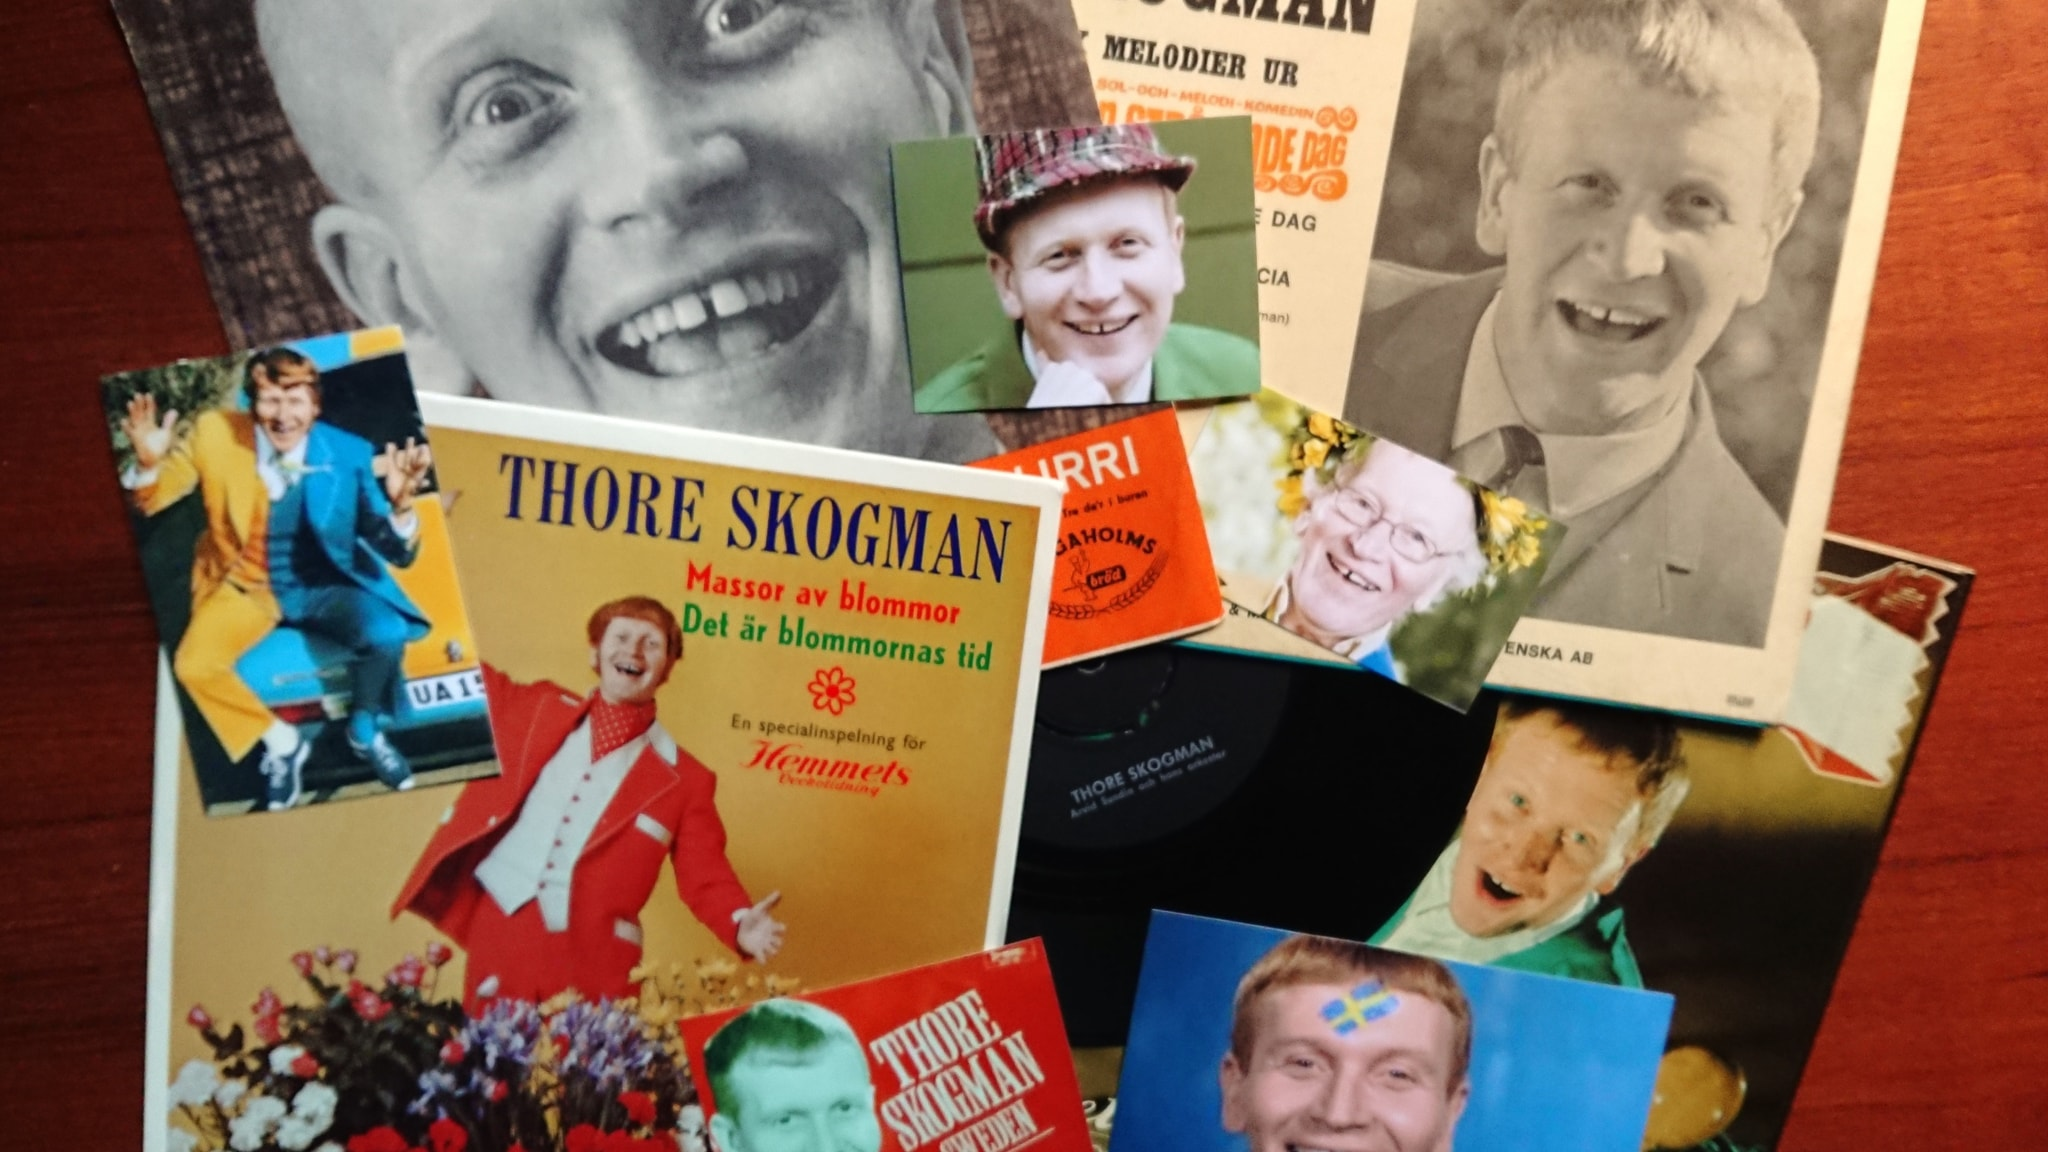 Om Thore Skogman